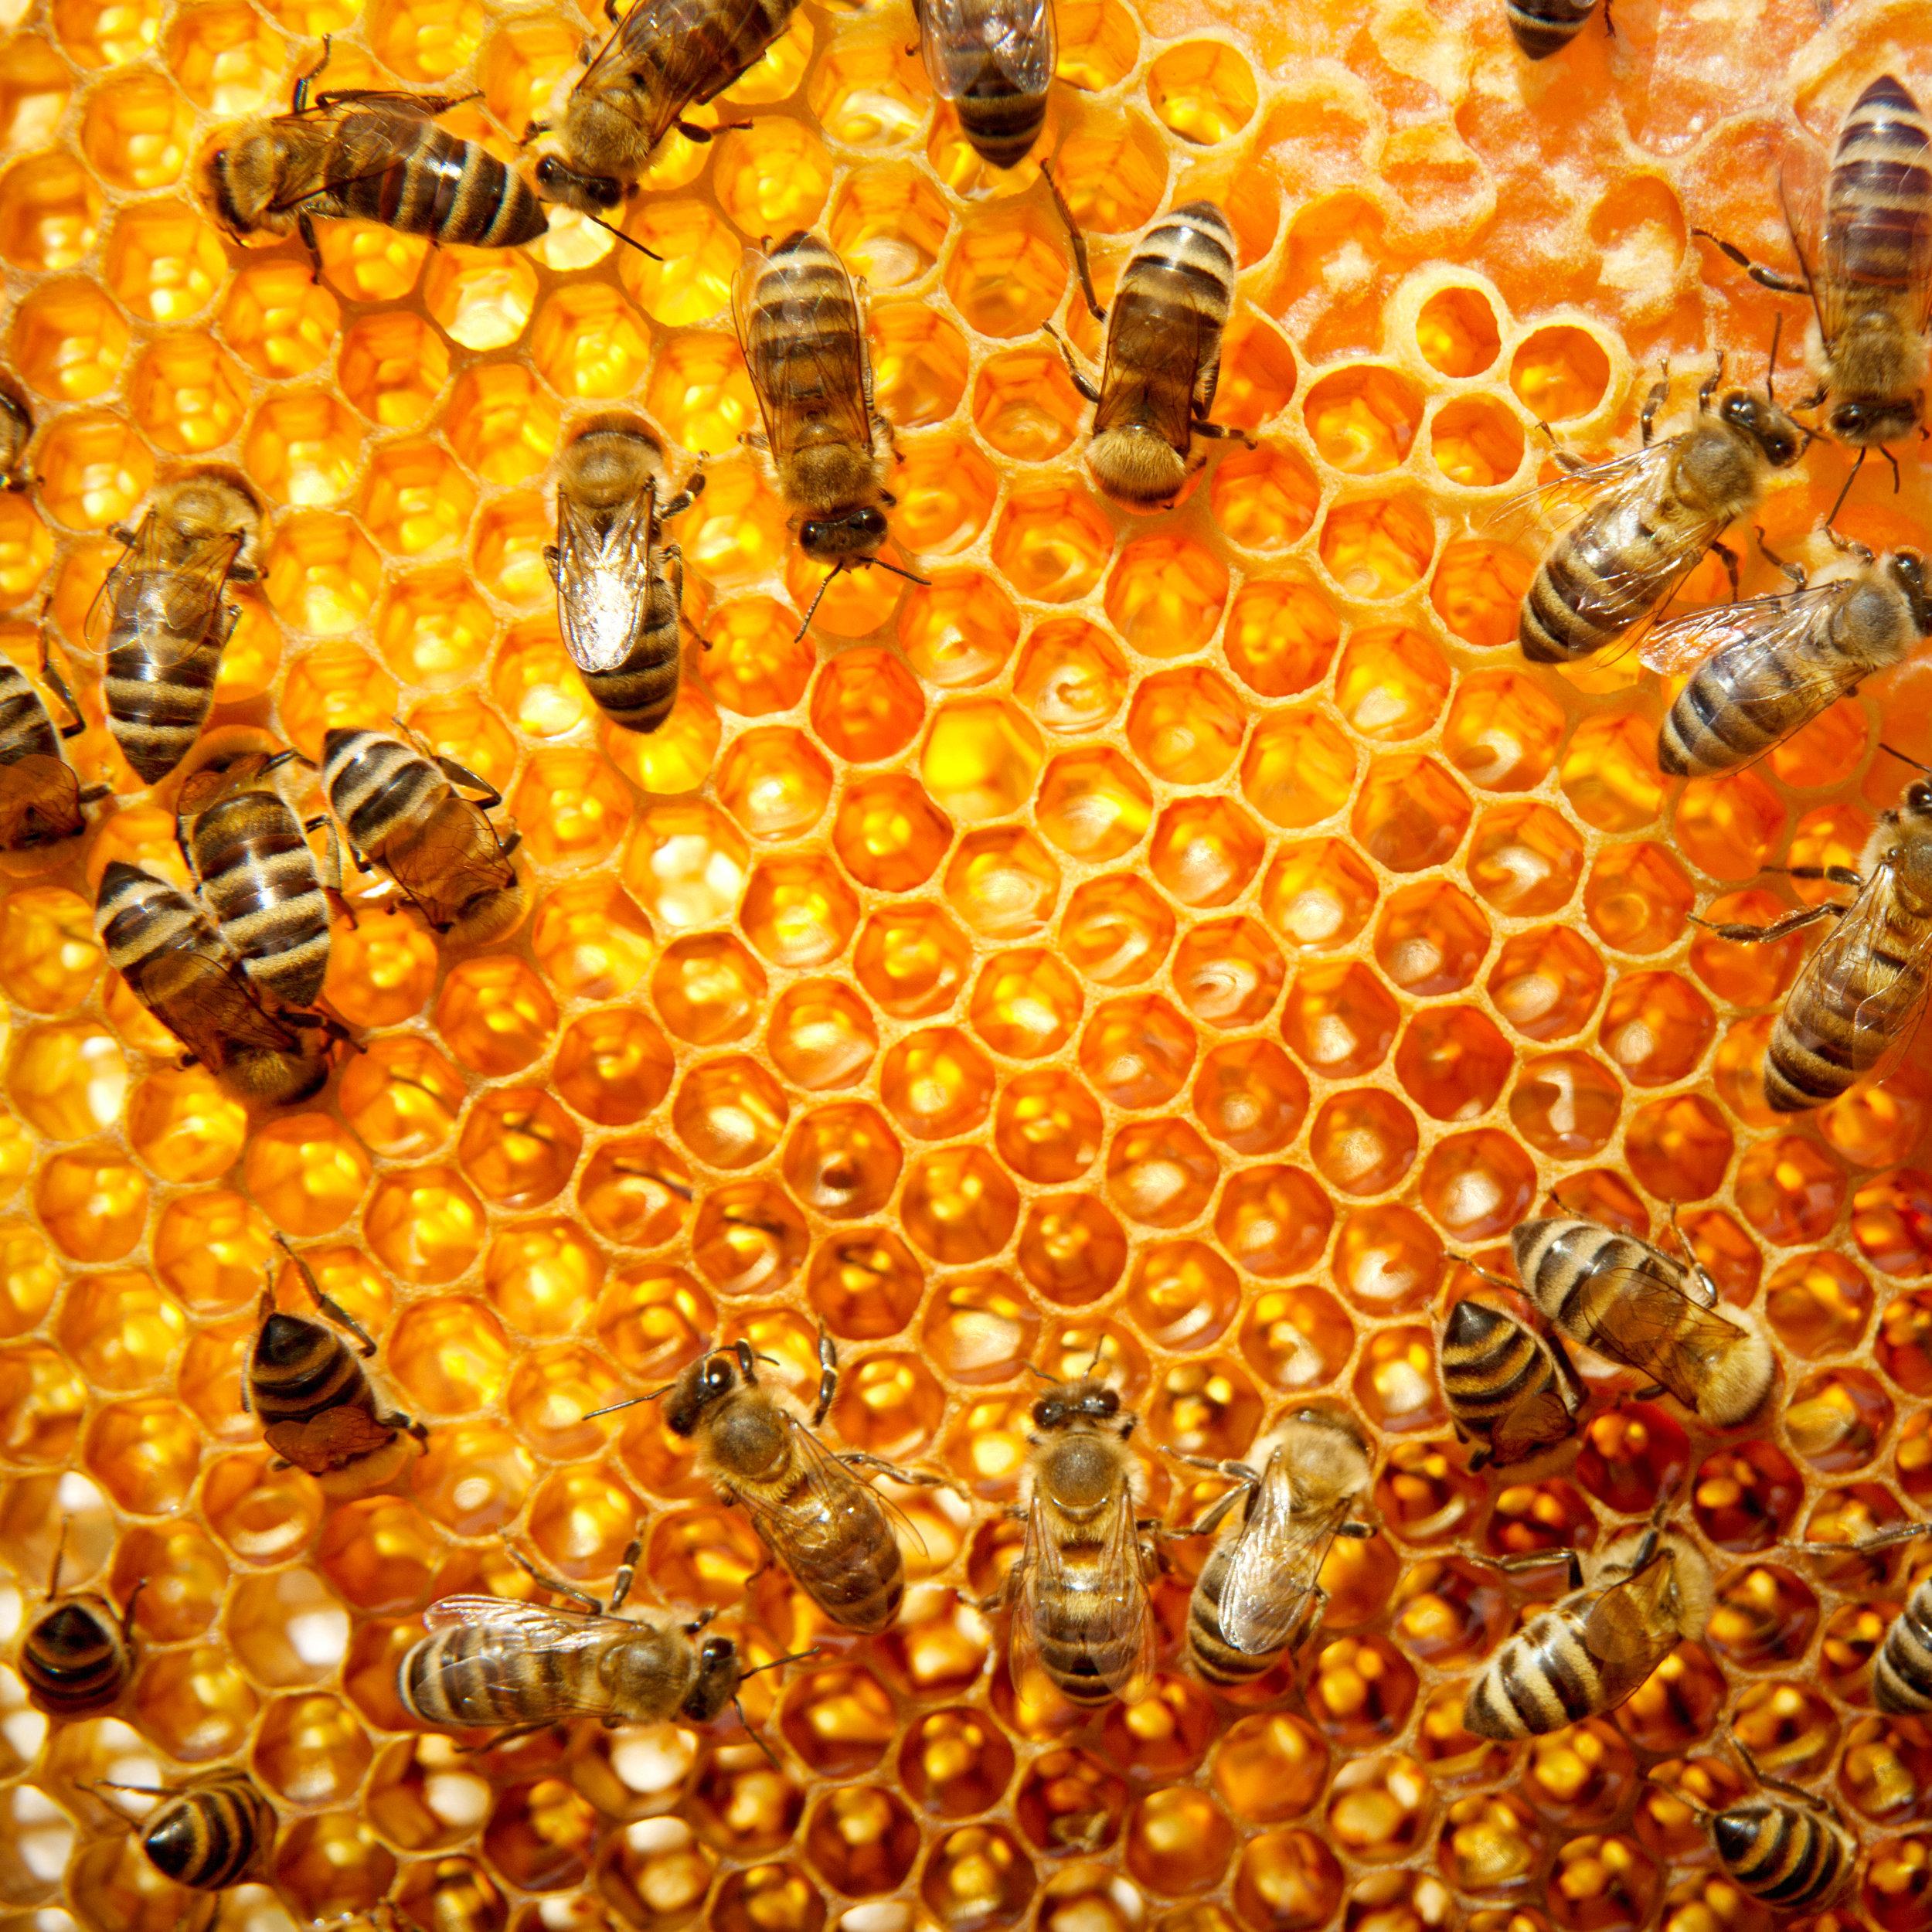 Honeycomb4.jpg